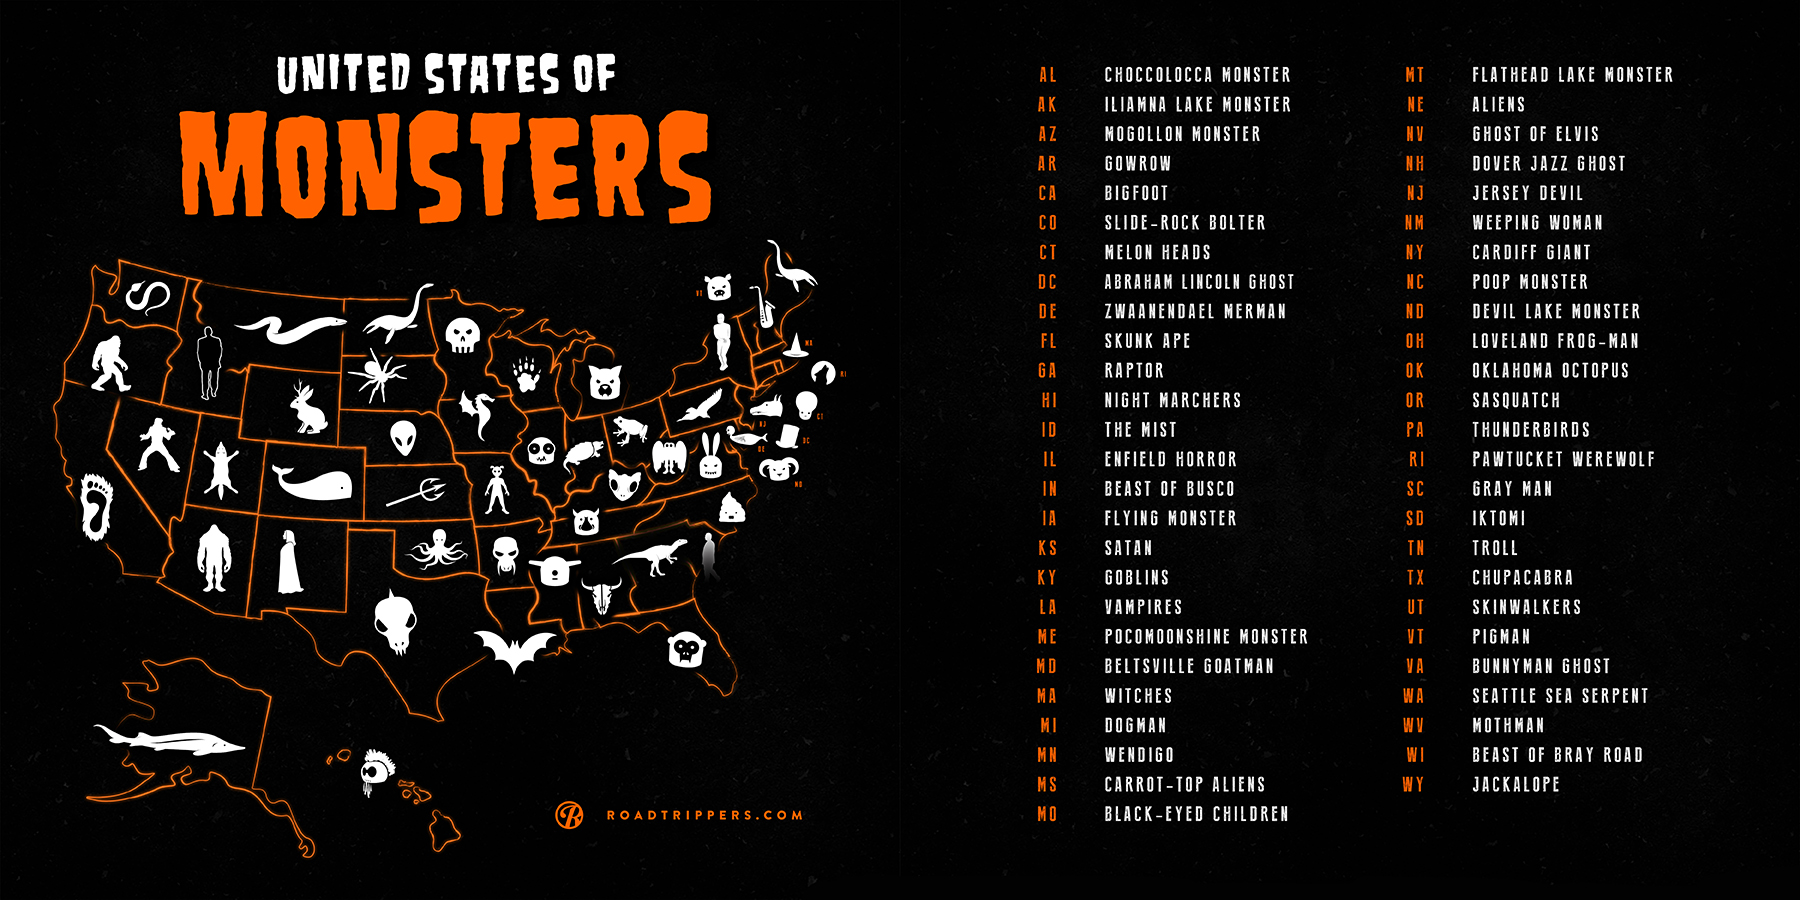 List Of Monsters In America